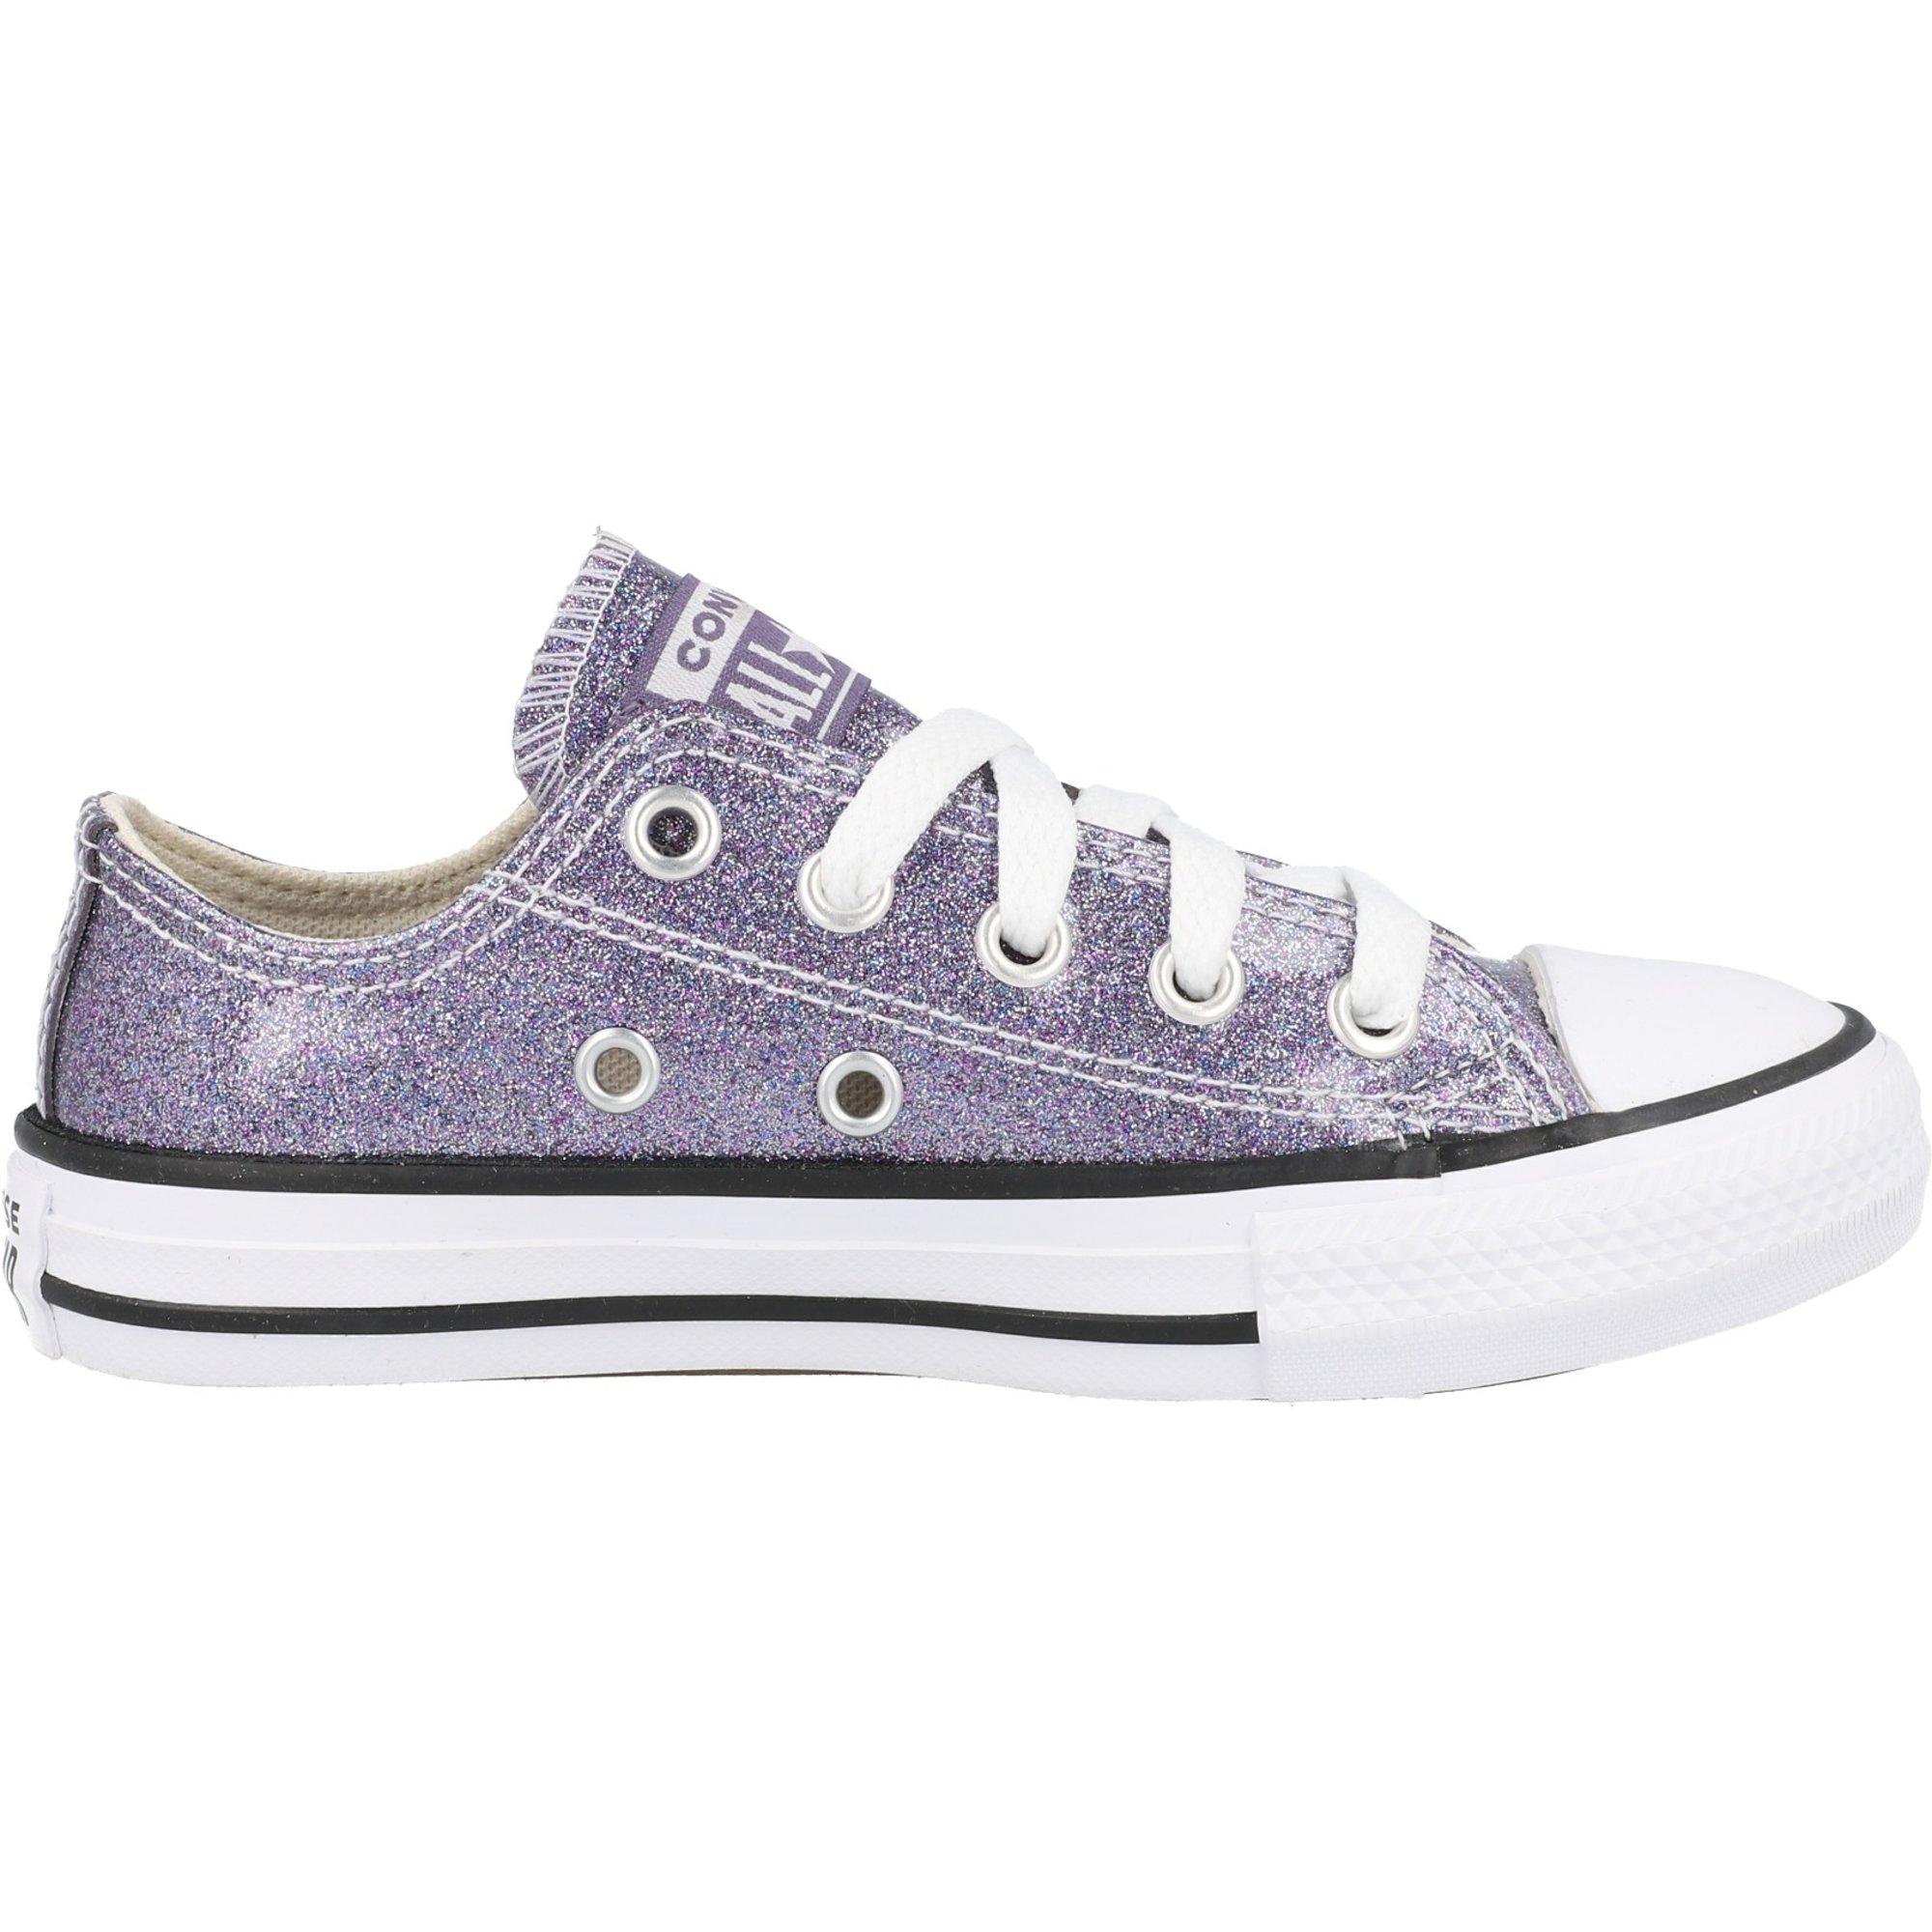 Converse Chuck Taylor All Star Ox Moody Purple/Black Coated Glitter